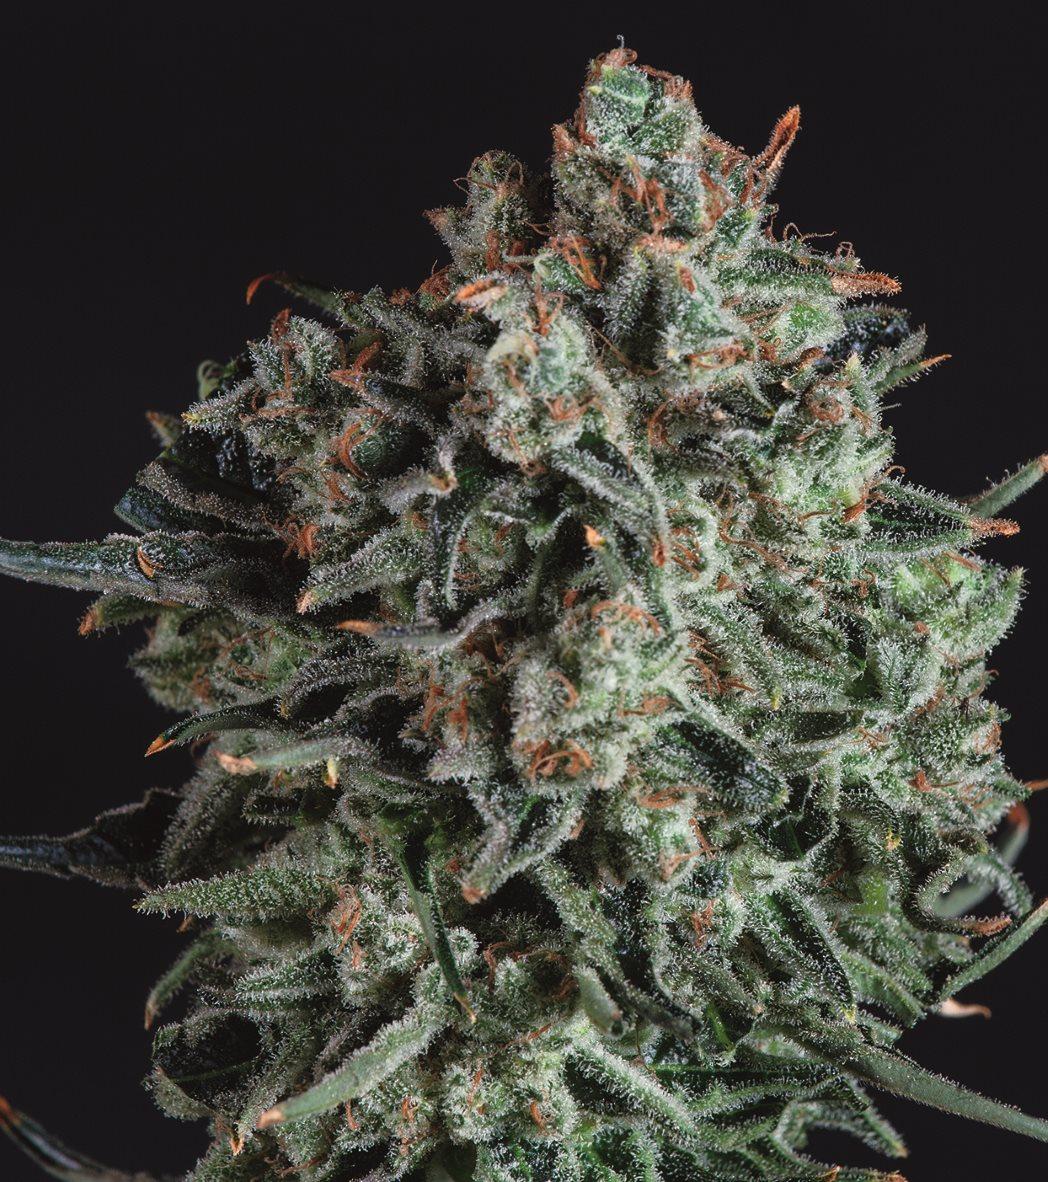 Blue Cheese x SCBDX Feminised Seeds